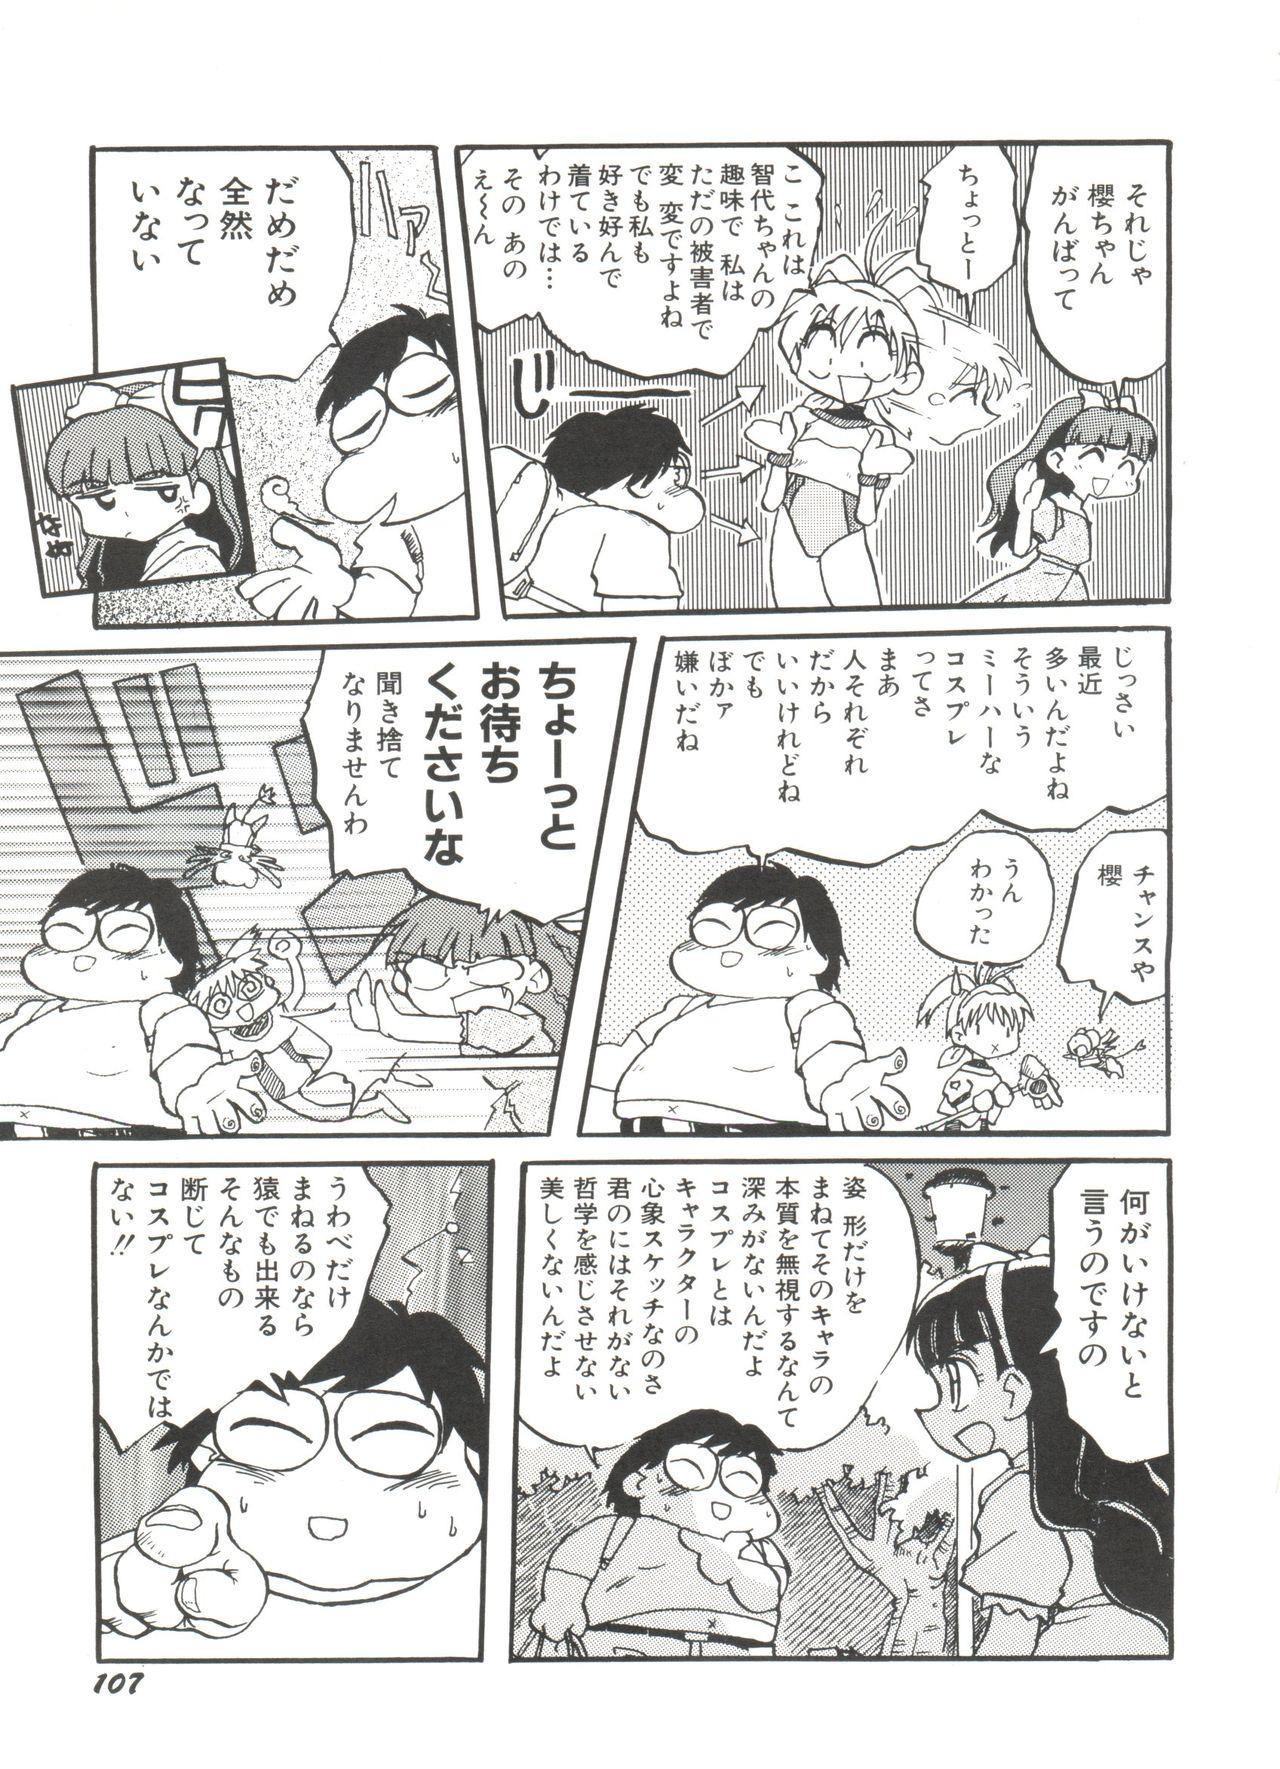 [Anthology] Denei Tamatebako 8 - Utakata no Tenshi-tachi II (Various) 108